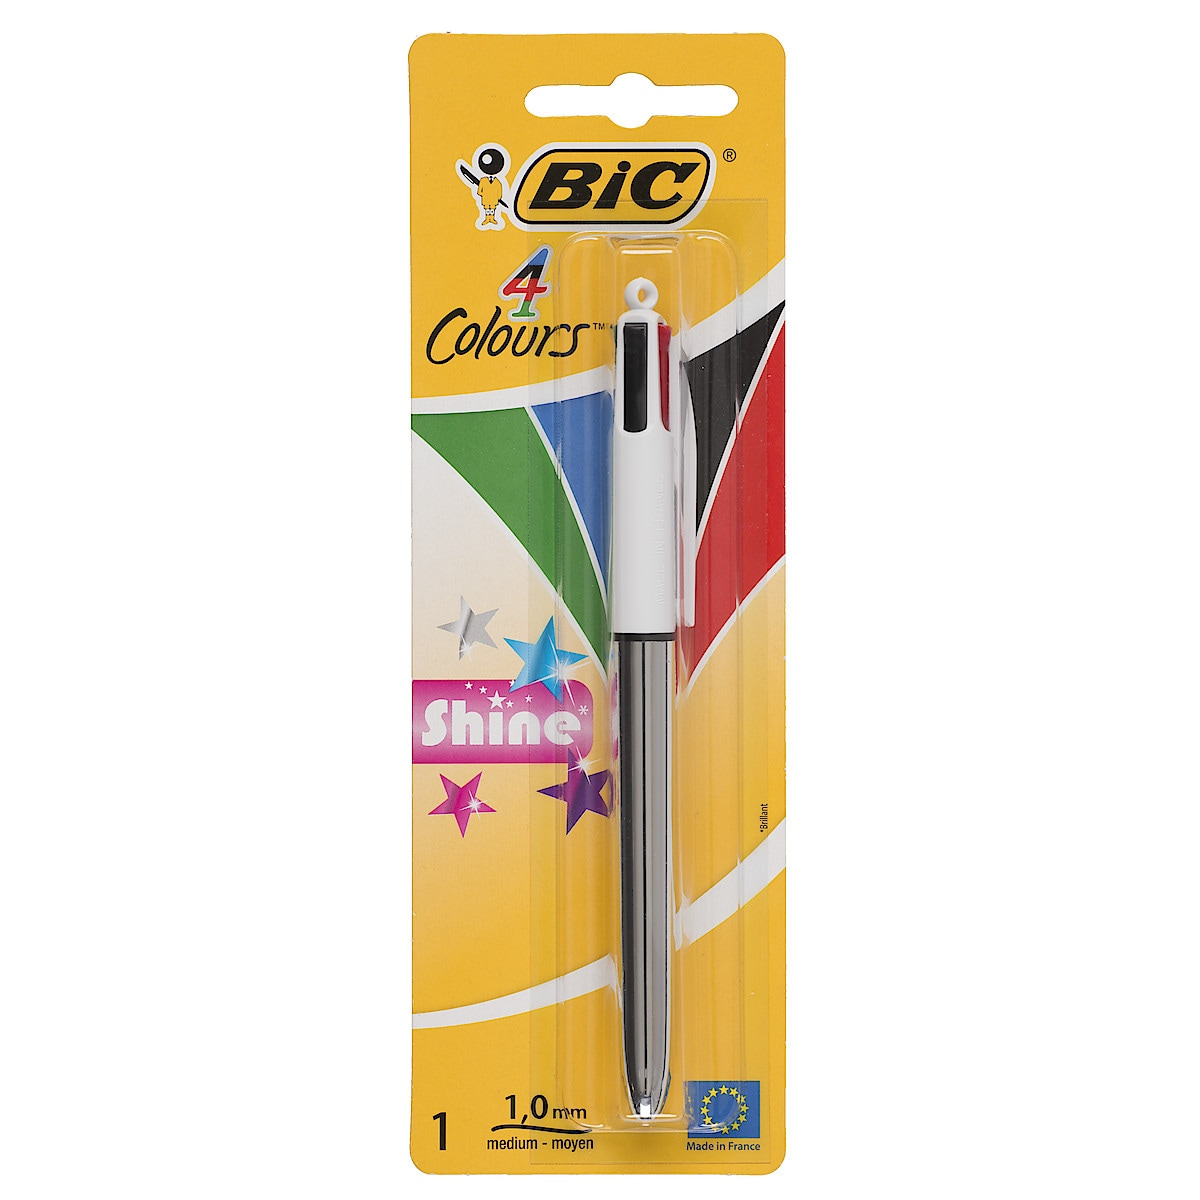 Kulspetspenna Bic 4 colours Shine